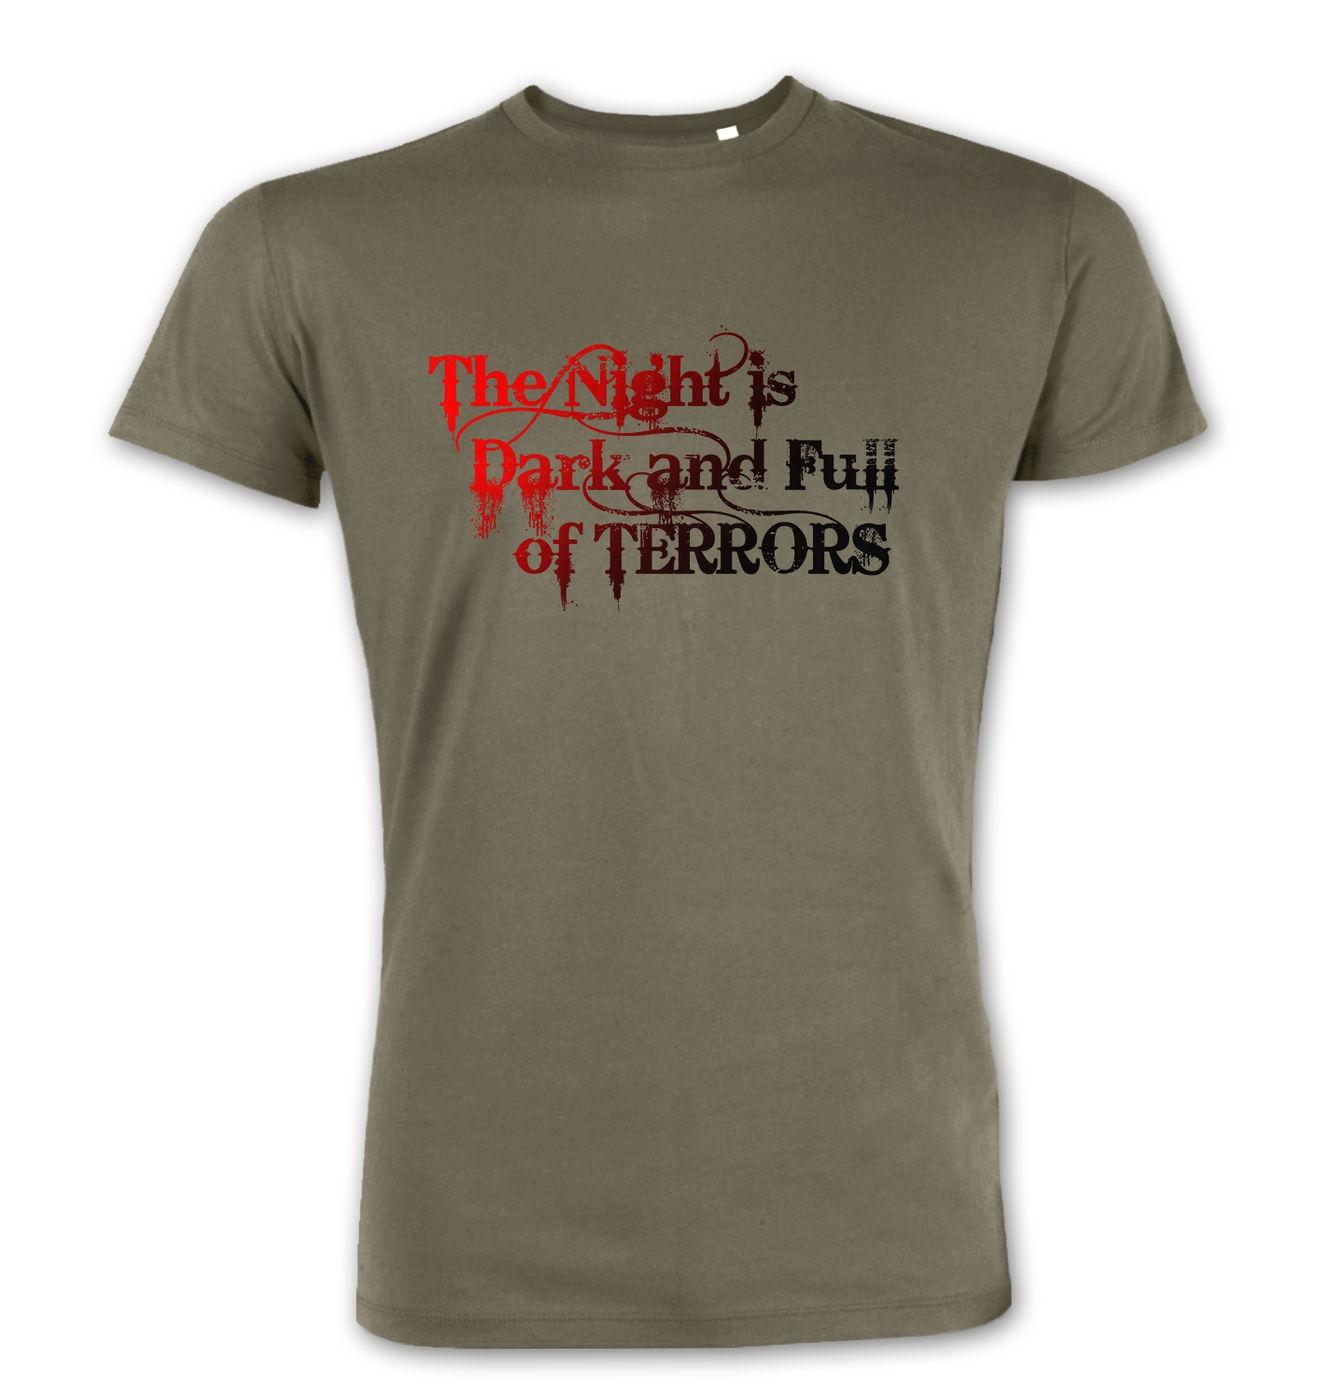 4a8b45ec The Night is Dark and Full of Terrors premium t-shirt - Somethinggeeky